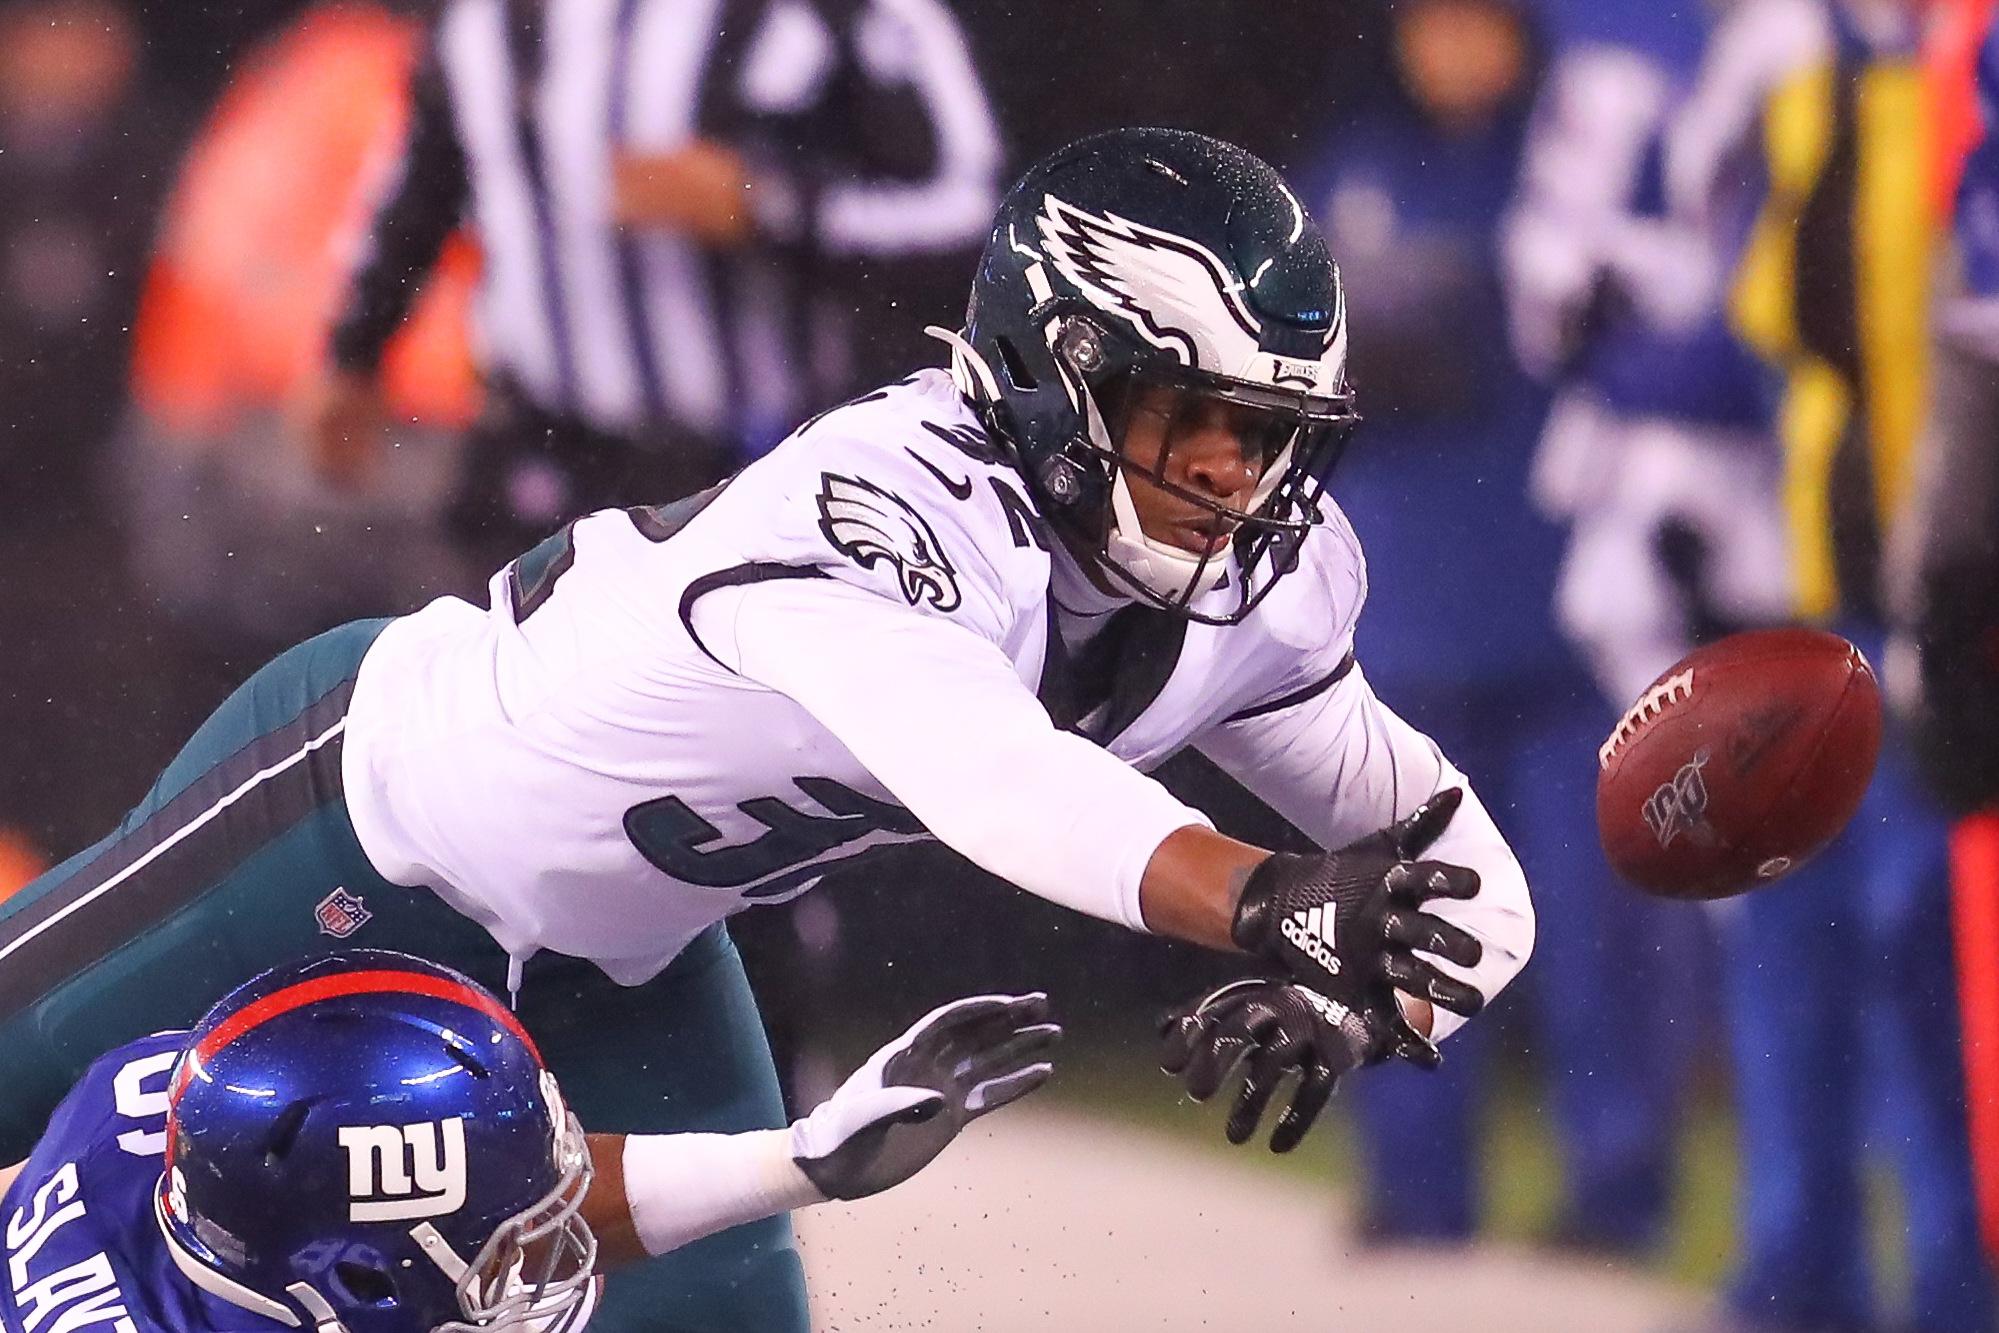 Bettor's Playbook - A look at NFL Week 17, Looking Ahead to Wild Card Weekend